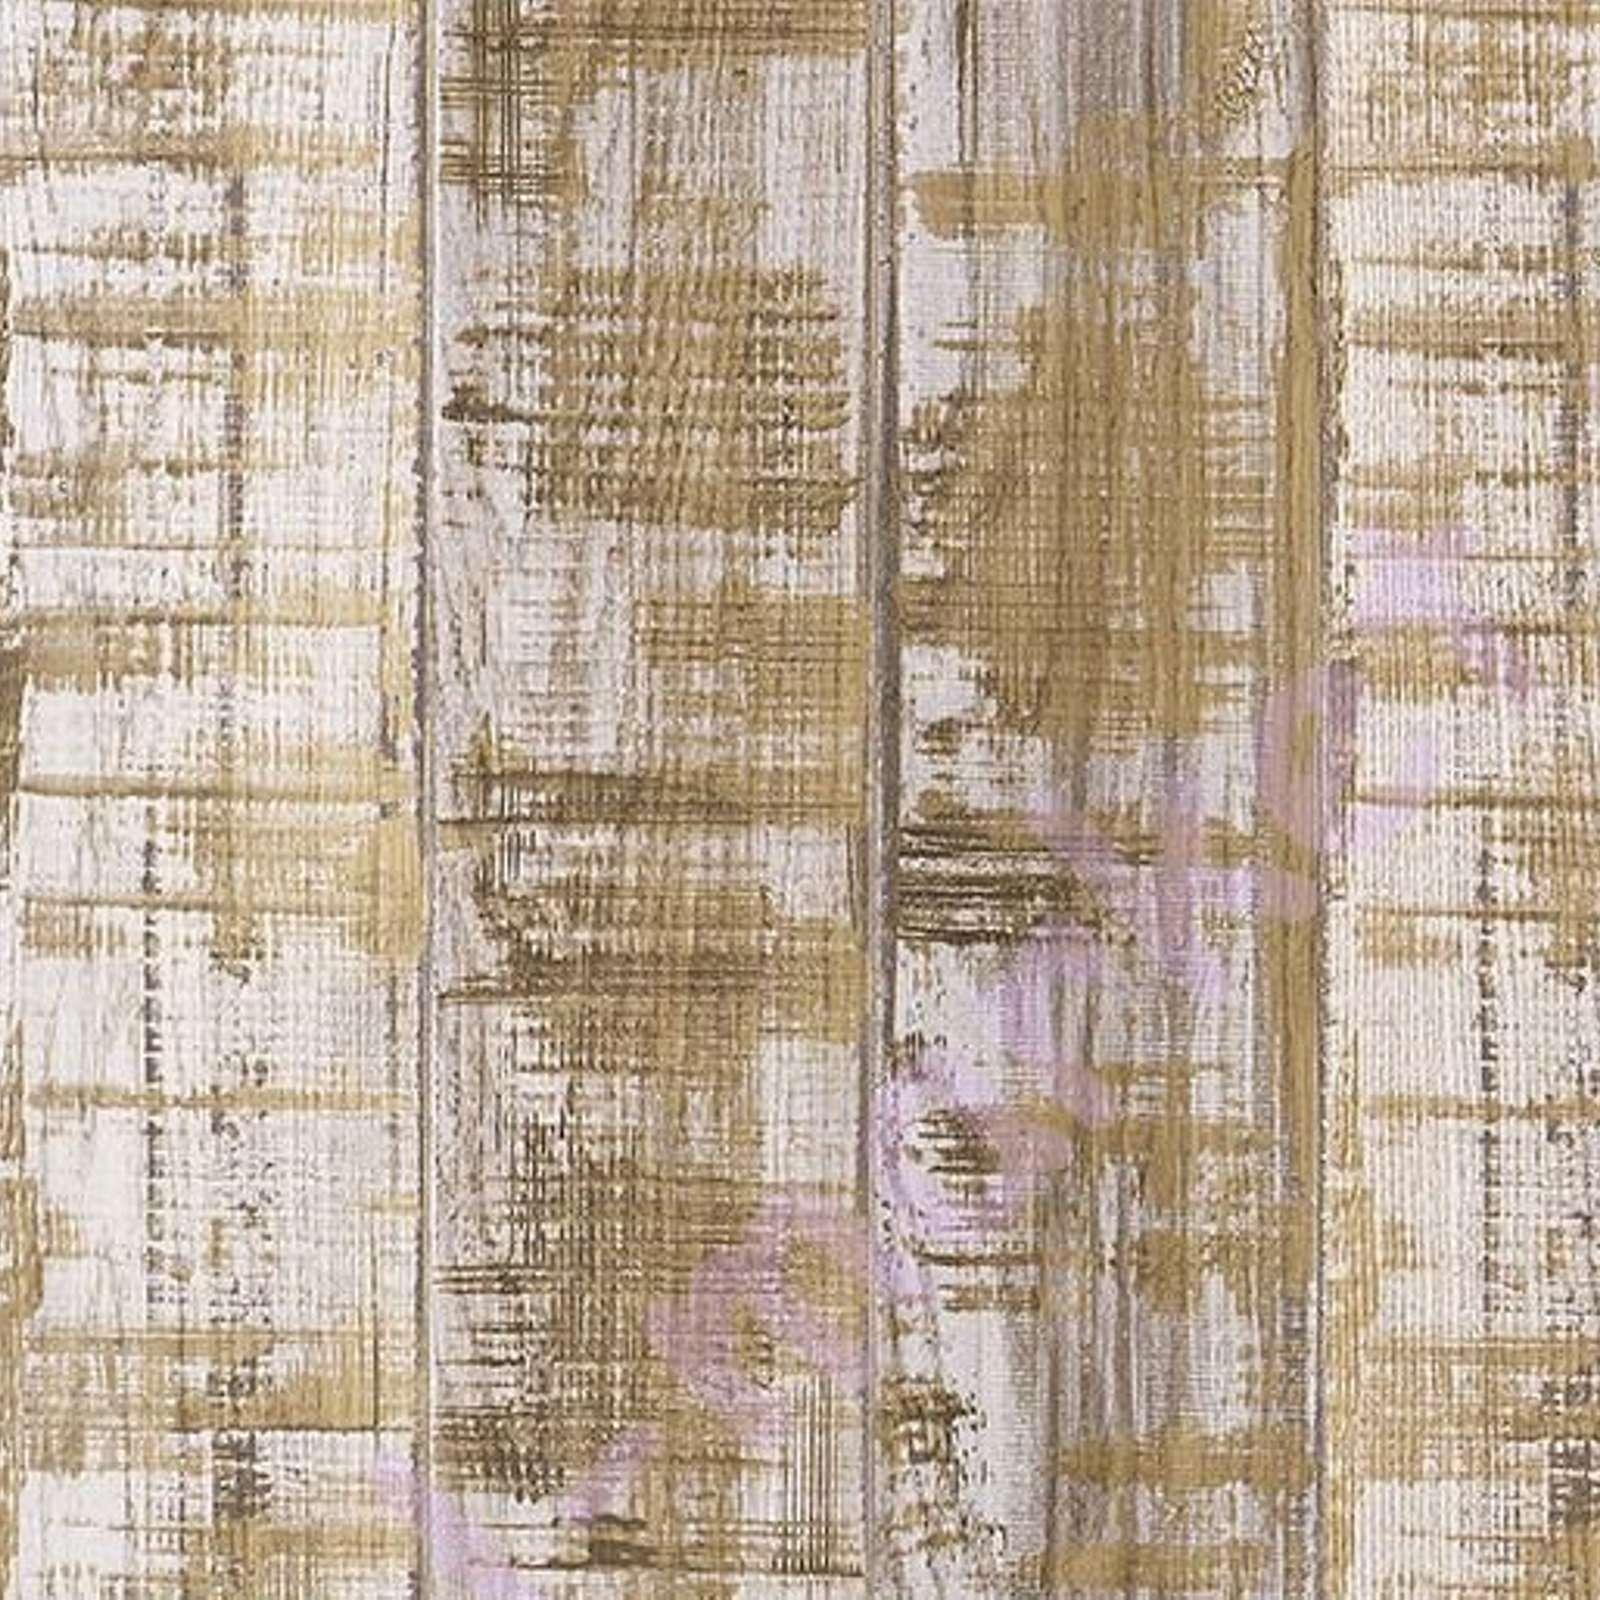 Паркет Tarkett коллекция Tango Art 1-полосный с замком T-lock White Oslo, 1-полосный, 550059011, 2215х164х14 мм, (6шт/2,18м2)